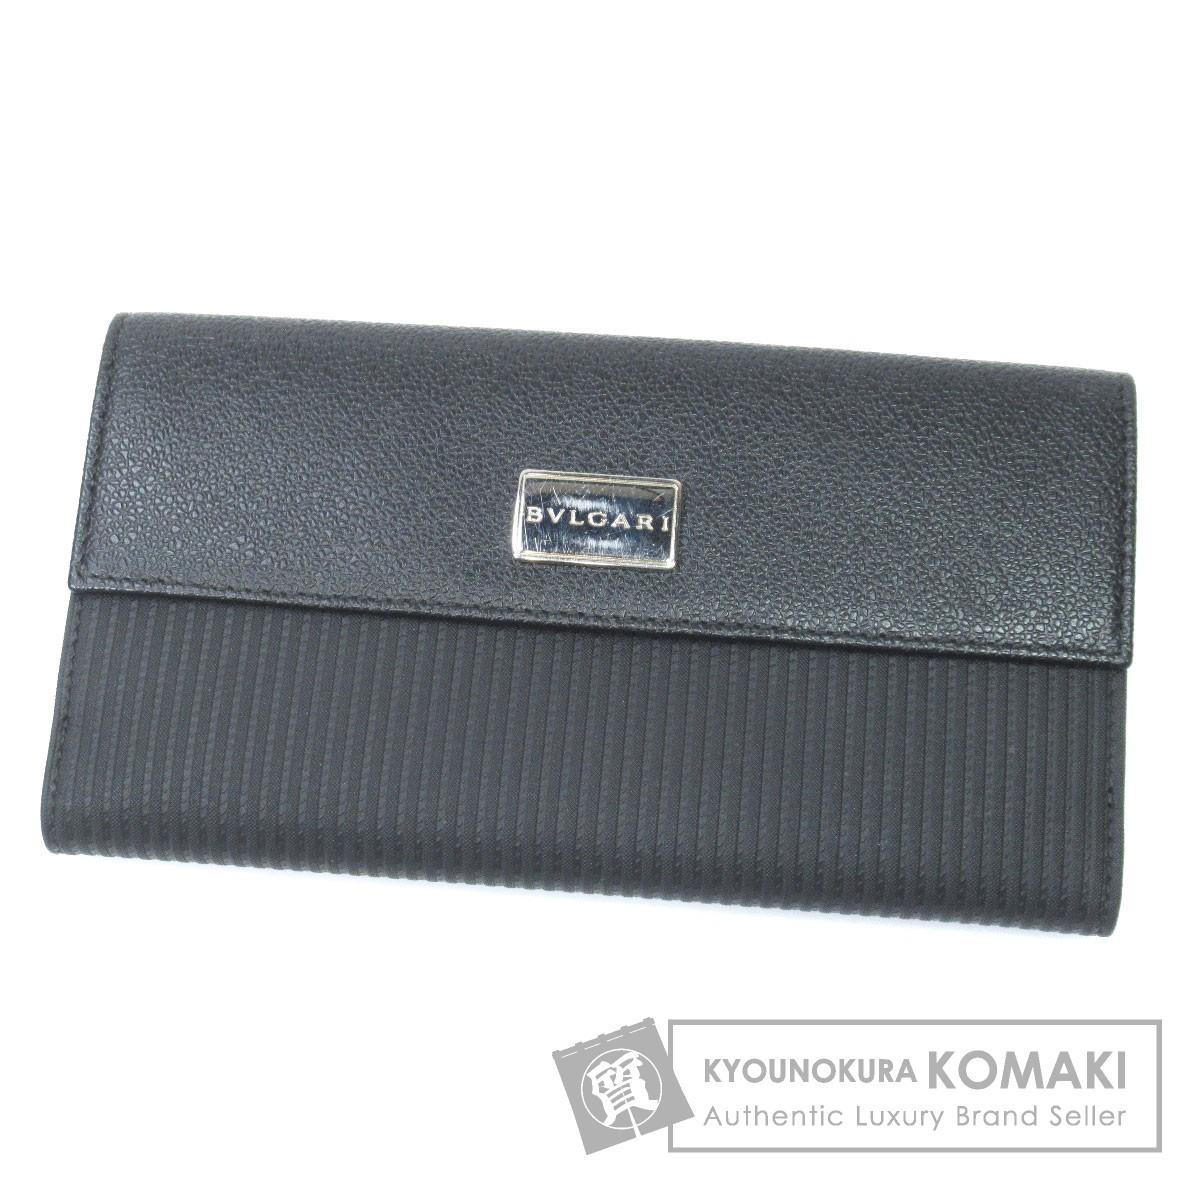 BVLGARI ロゴマーク 長財布(小銭入れあり) レザー/PVC レディース 【中古】【ブルガリ】